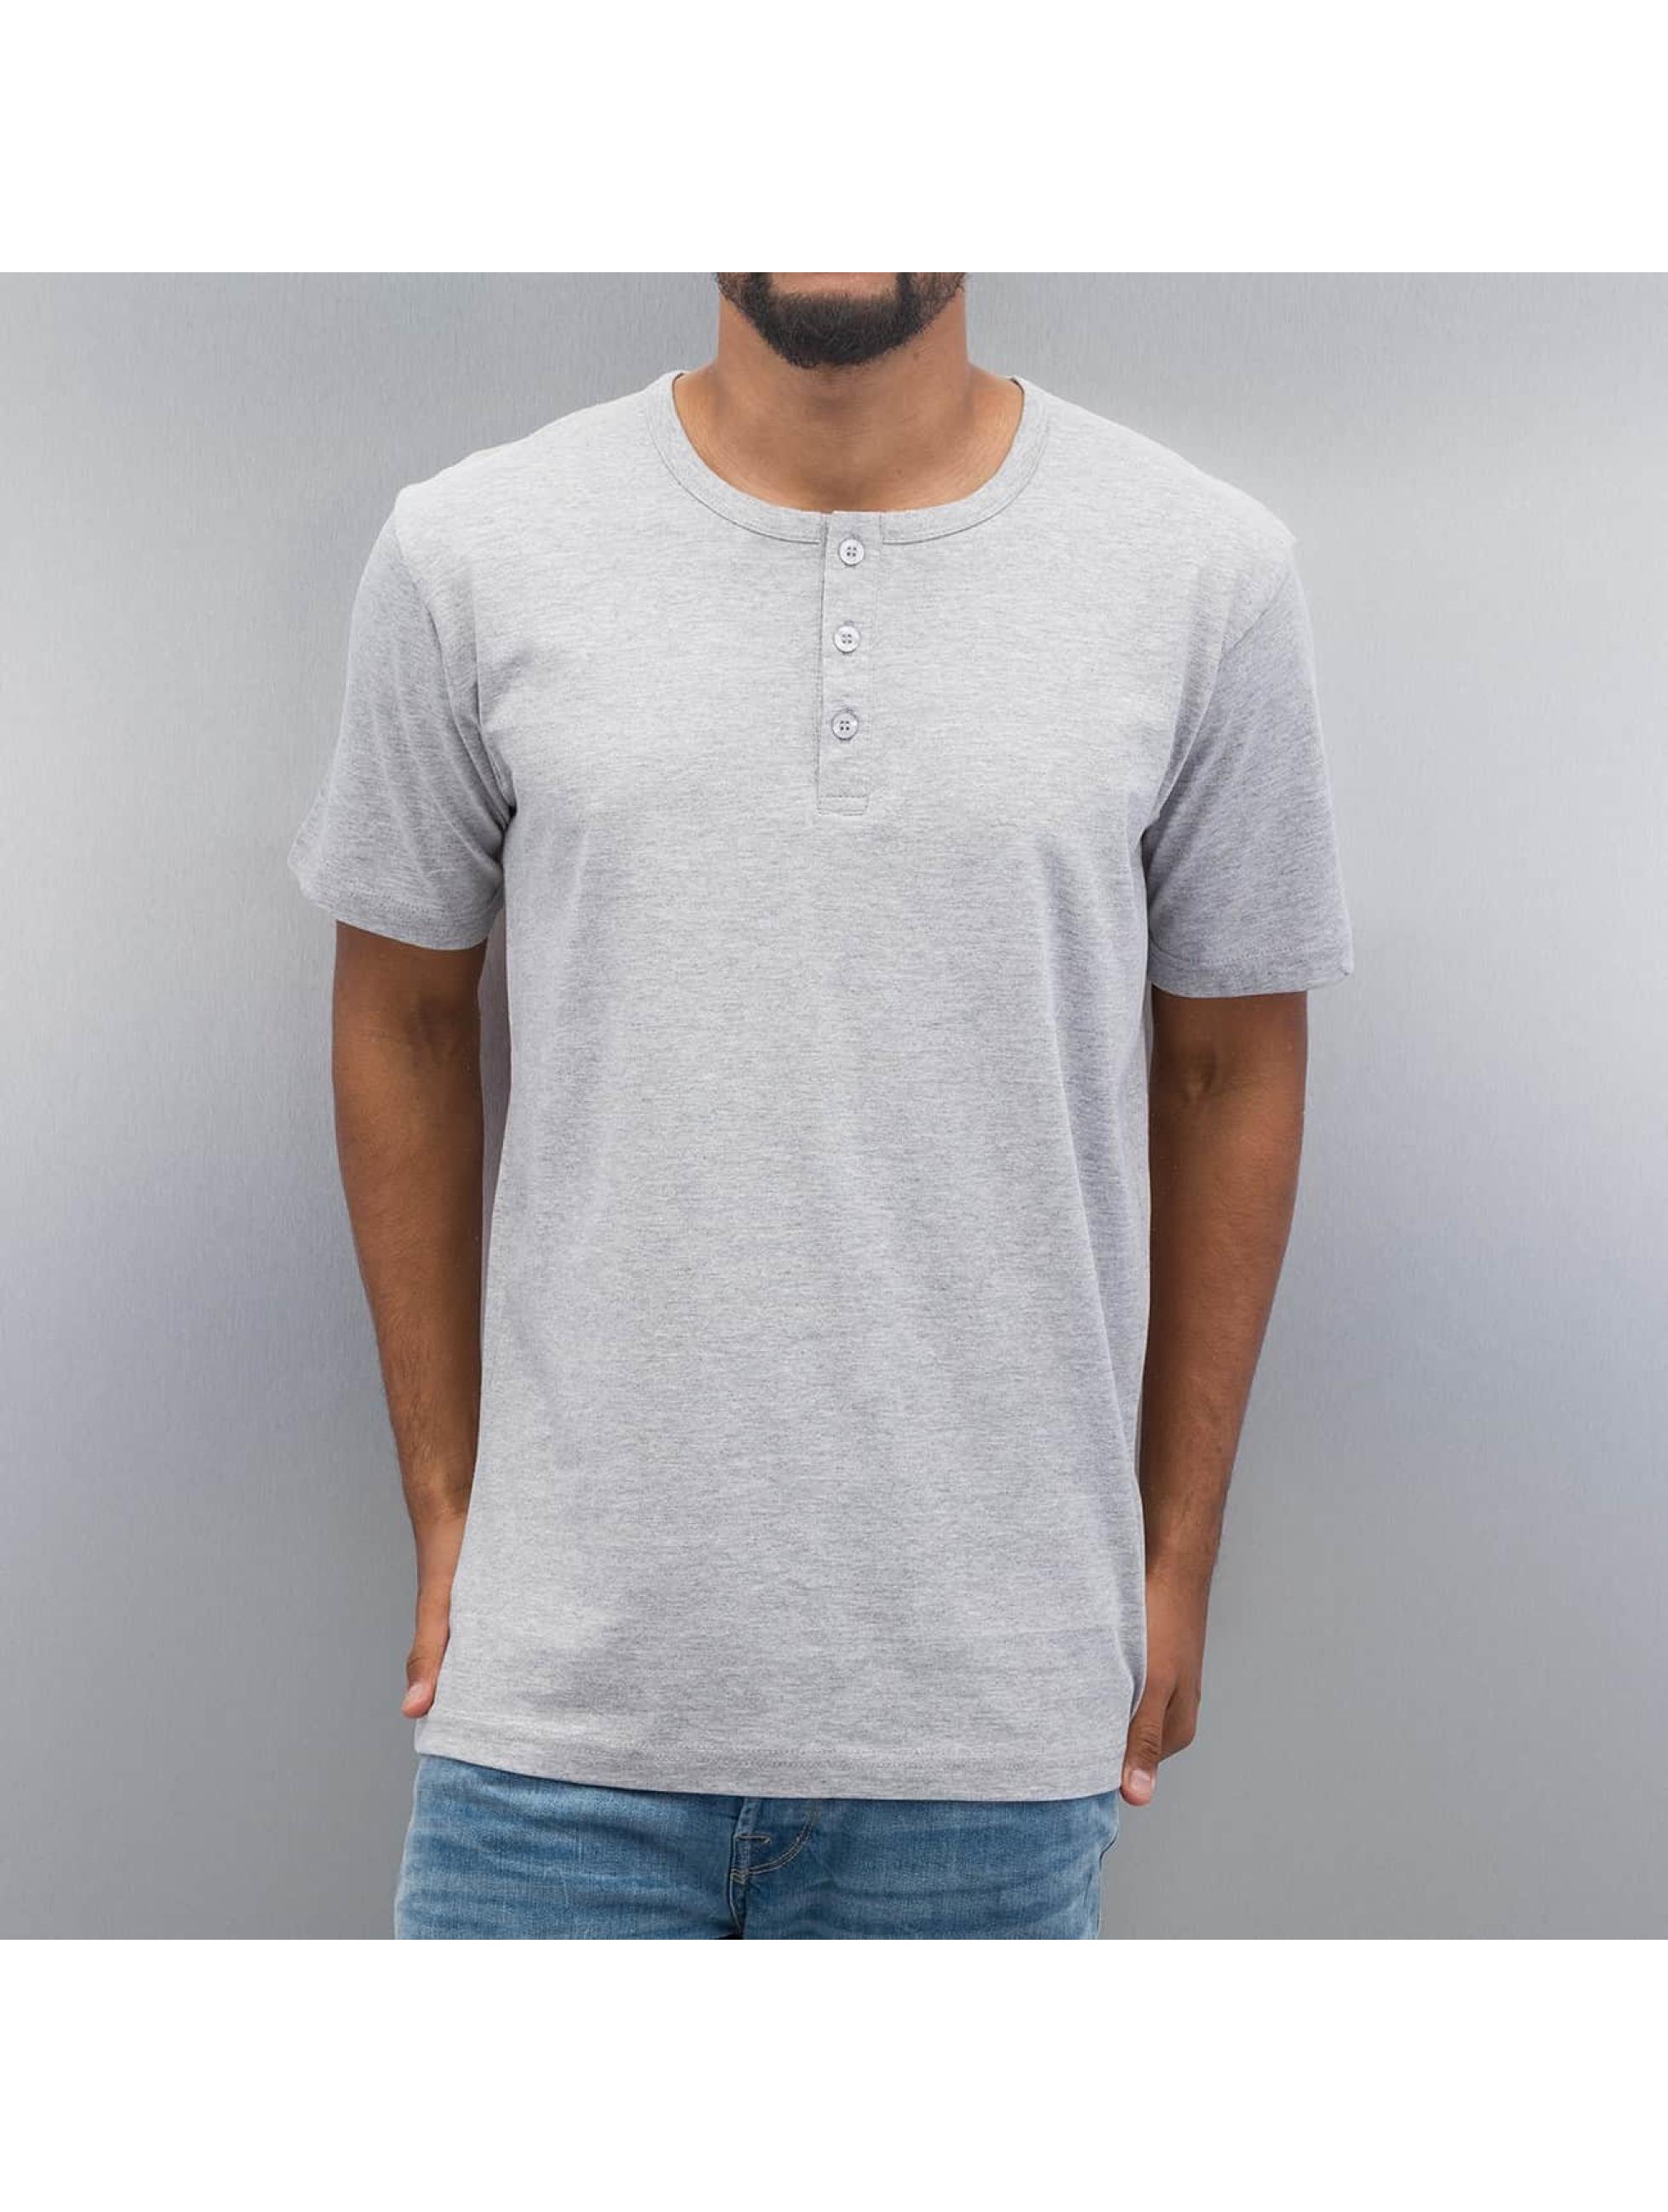 Cyprime Placket T Shirt Grey